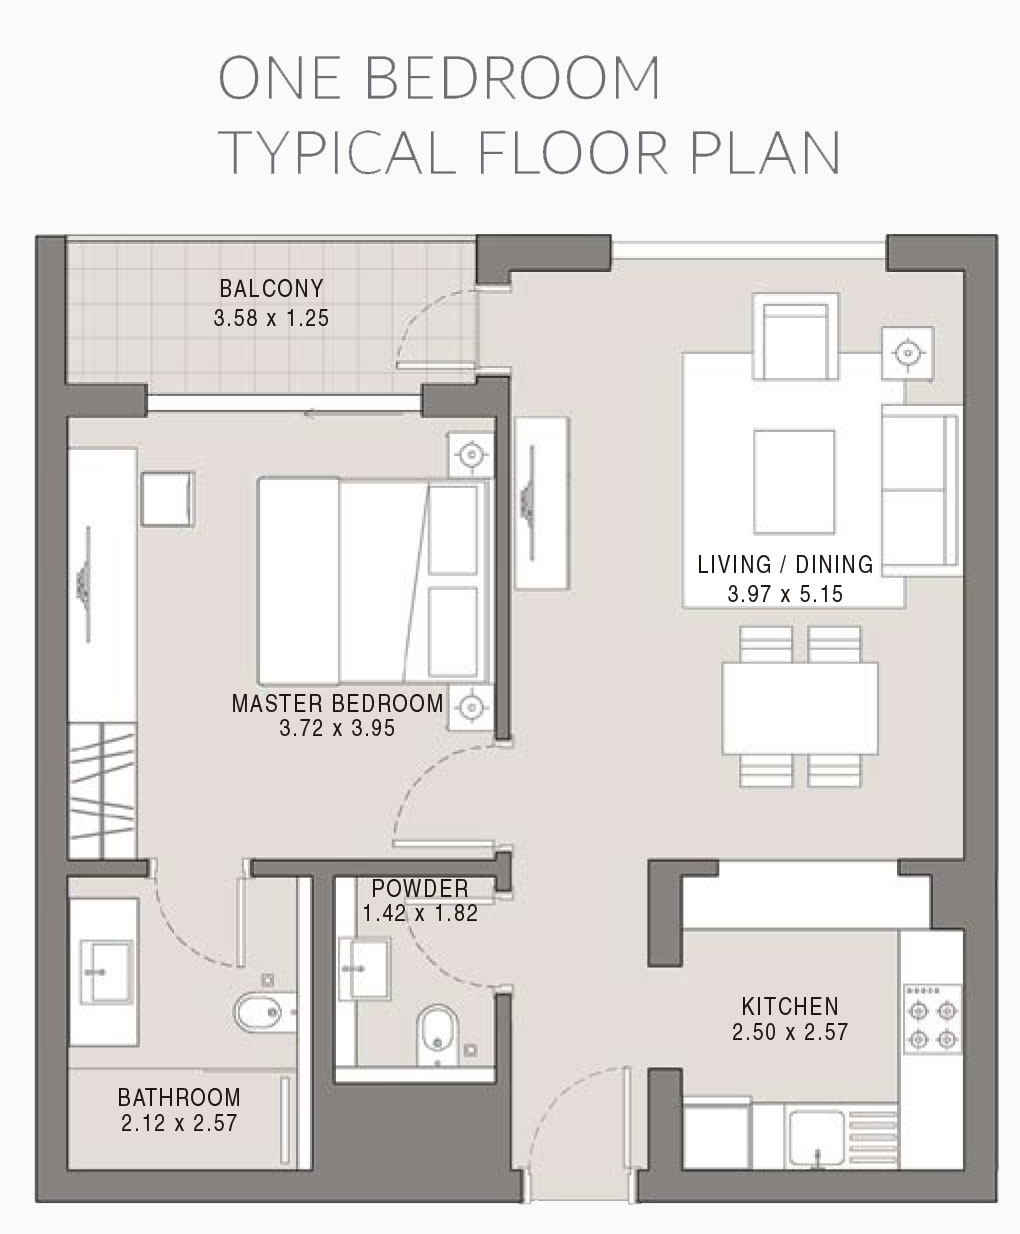 1BDR-Typical-Floor-Plan